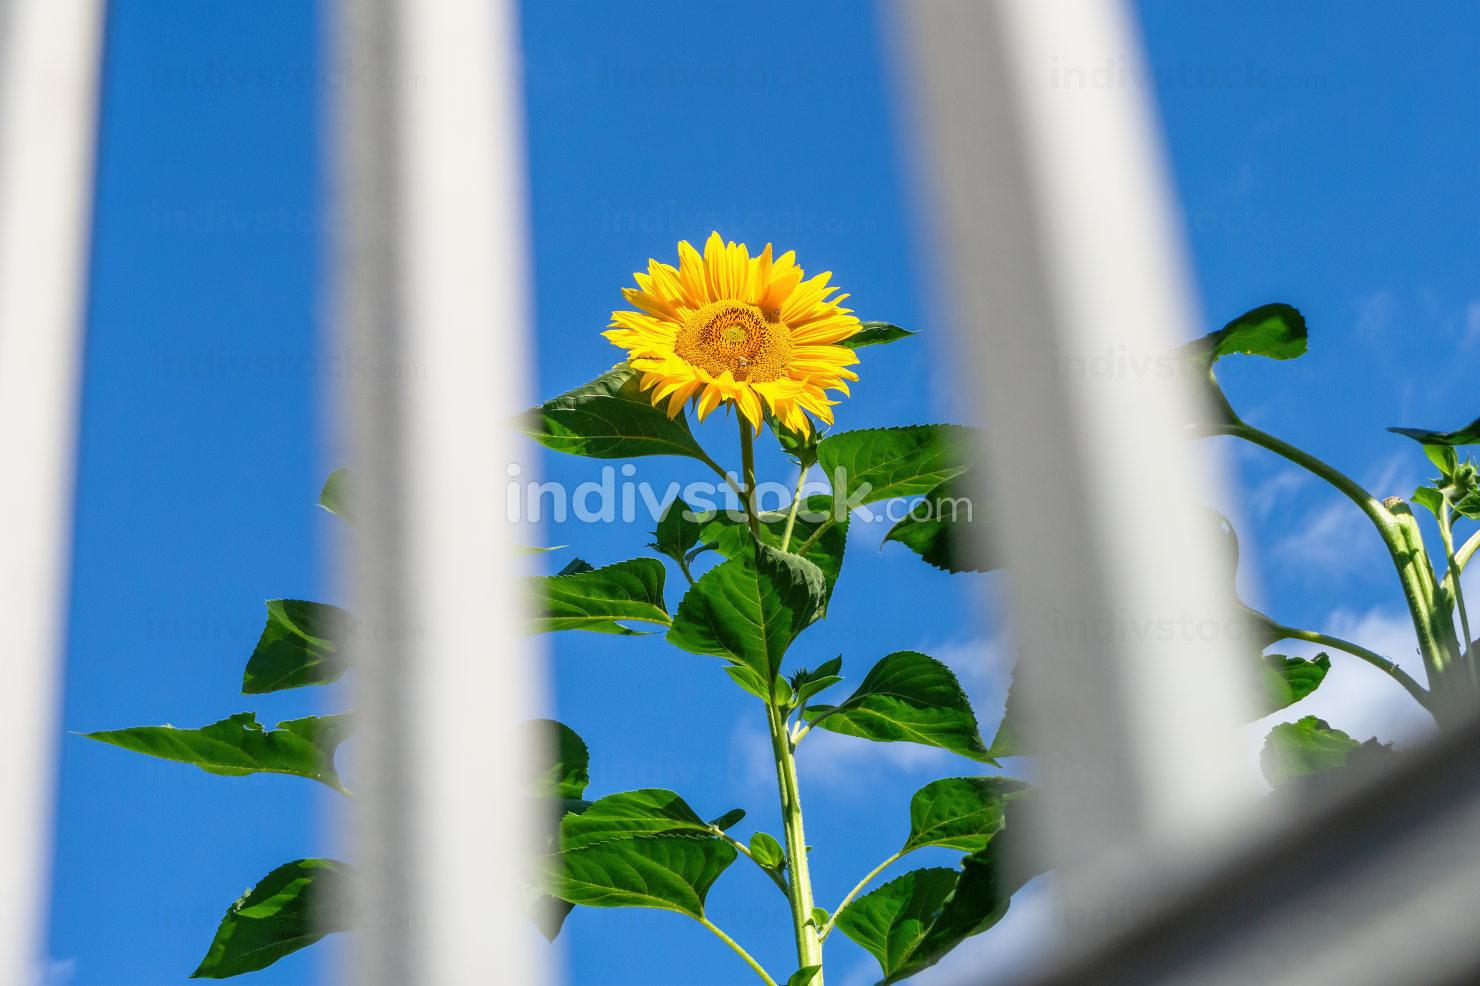 single sunflower behind grid